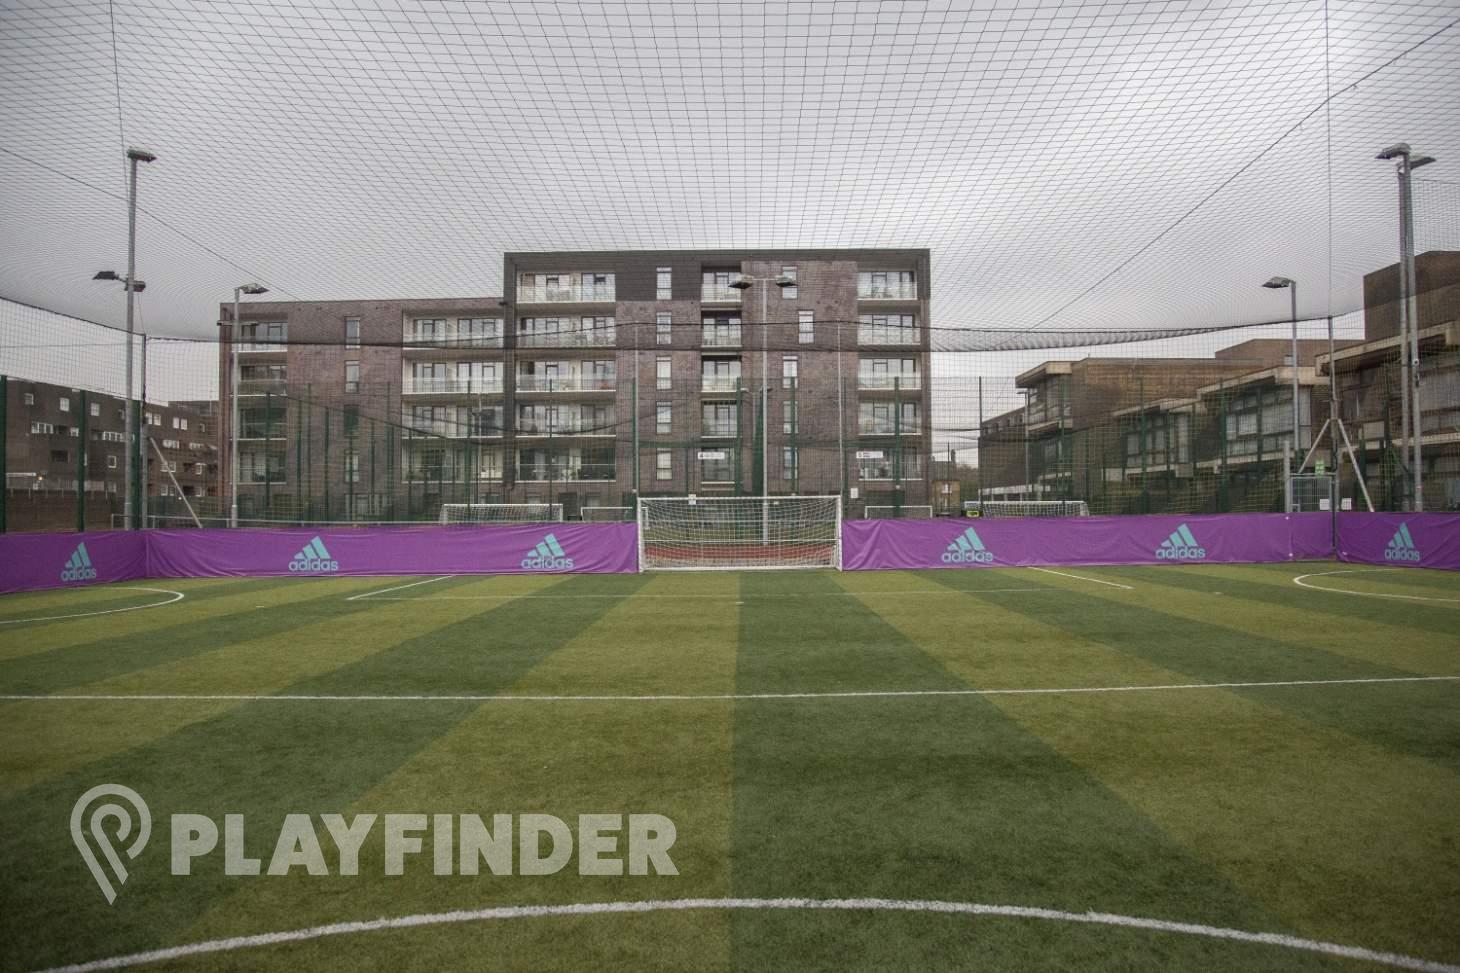 Powerleague Vauxhall 7 a side | 3G Astroturf football pitch